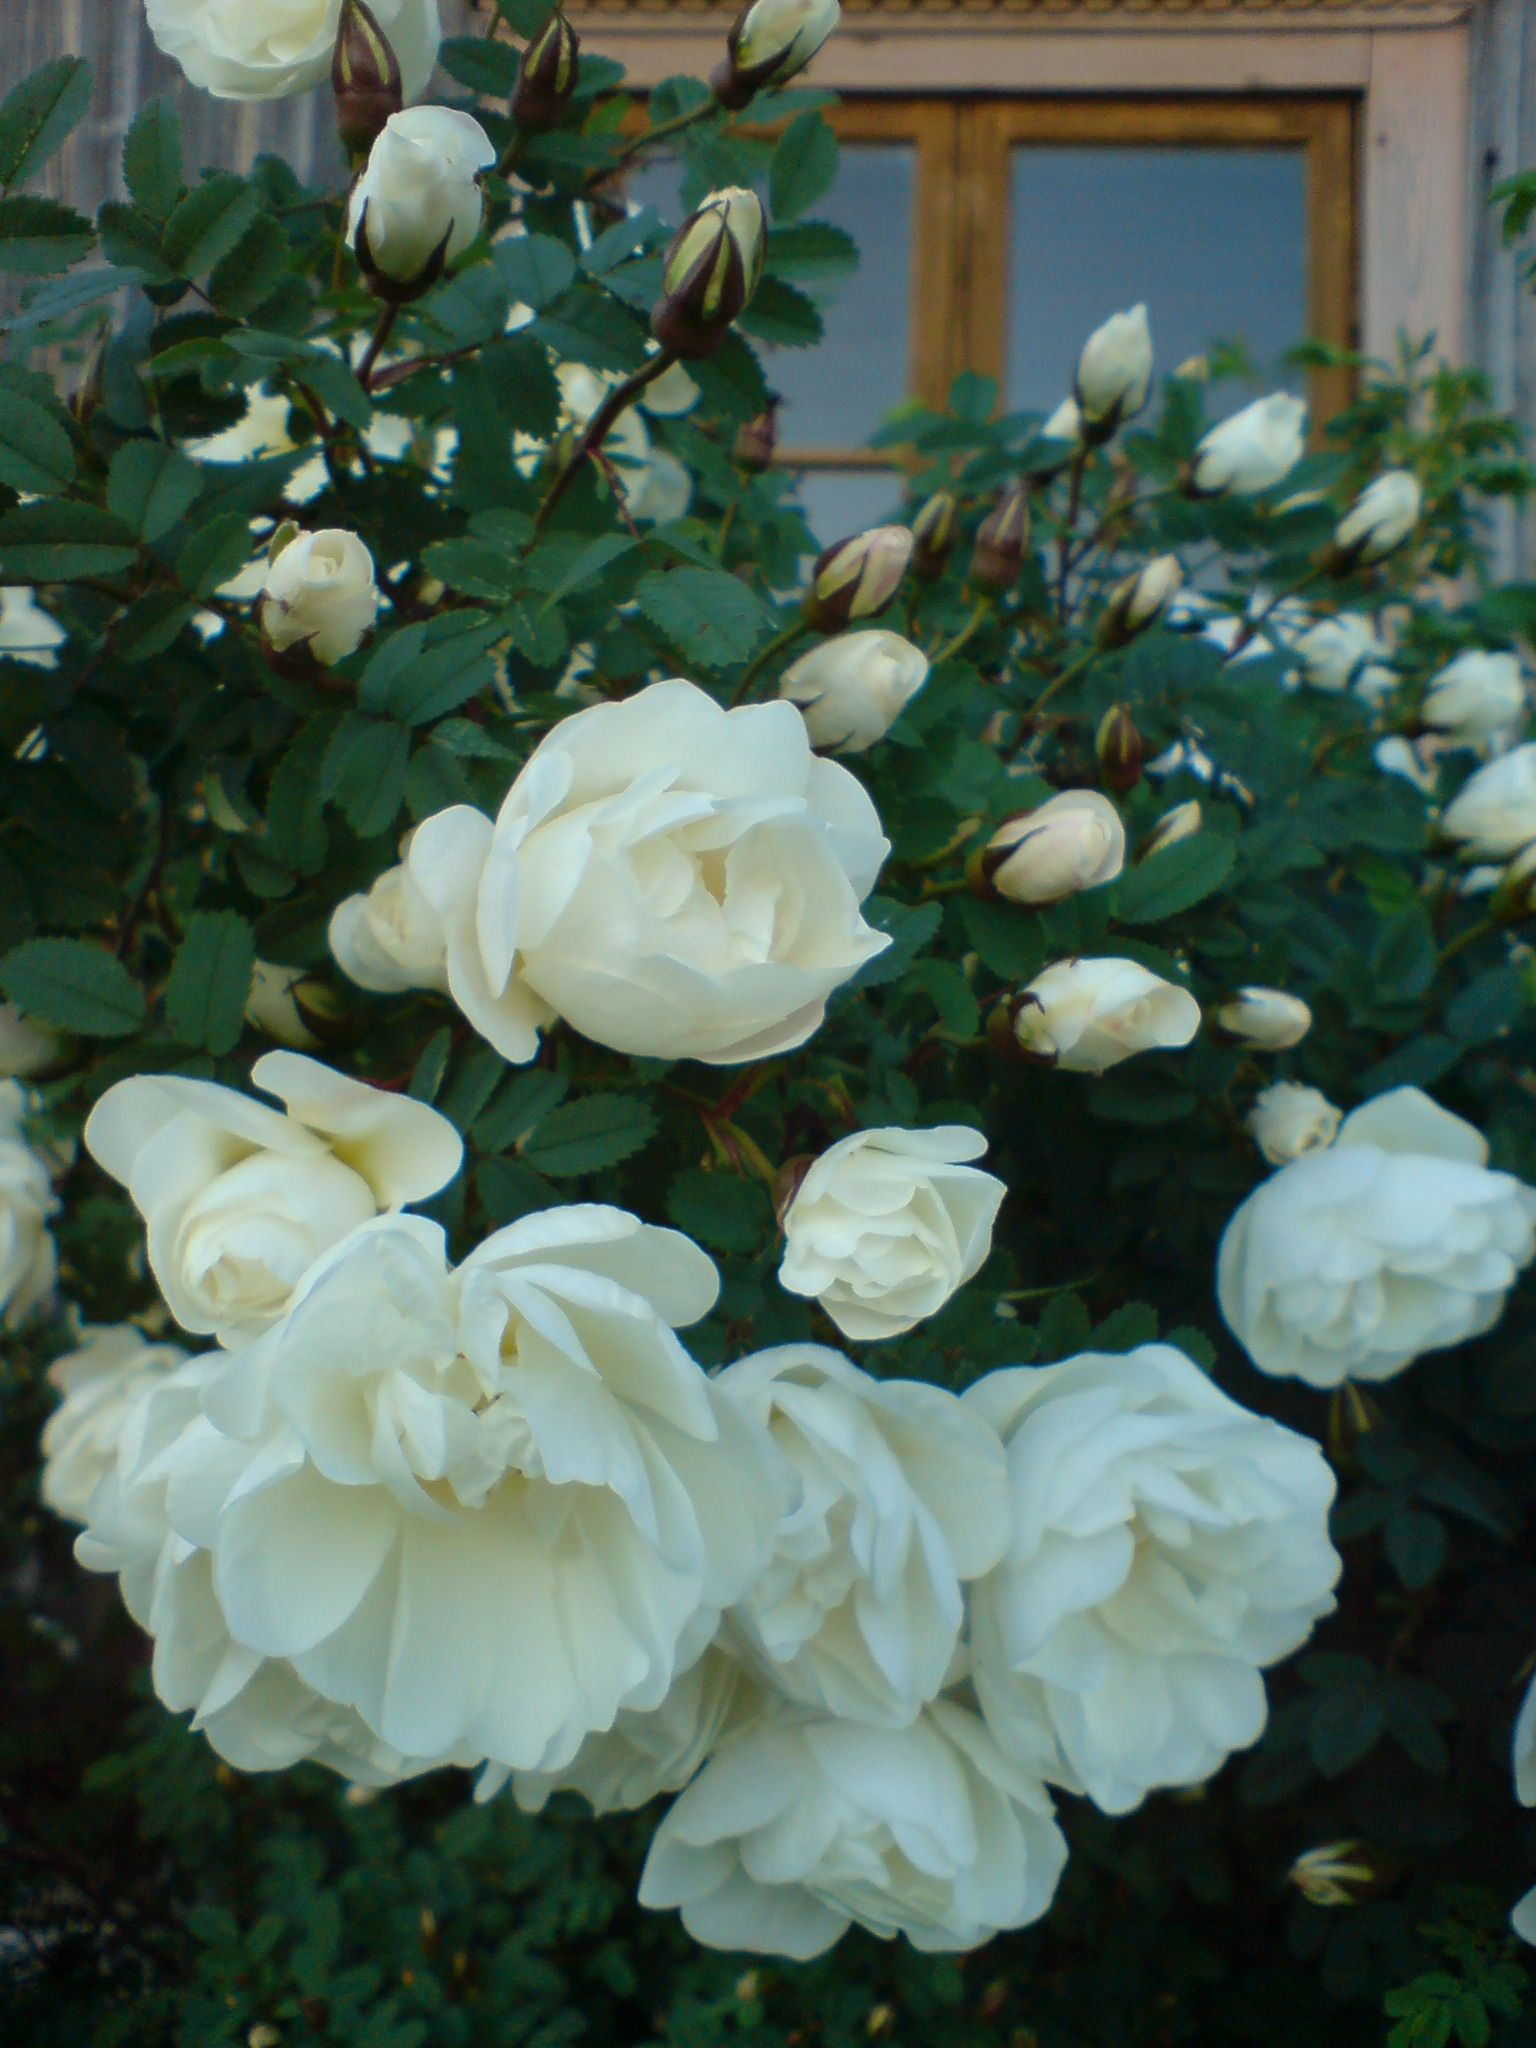 """Juhannusruusu"", The Finnish White Rose (midsummer rose"